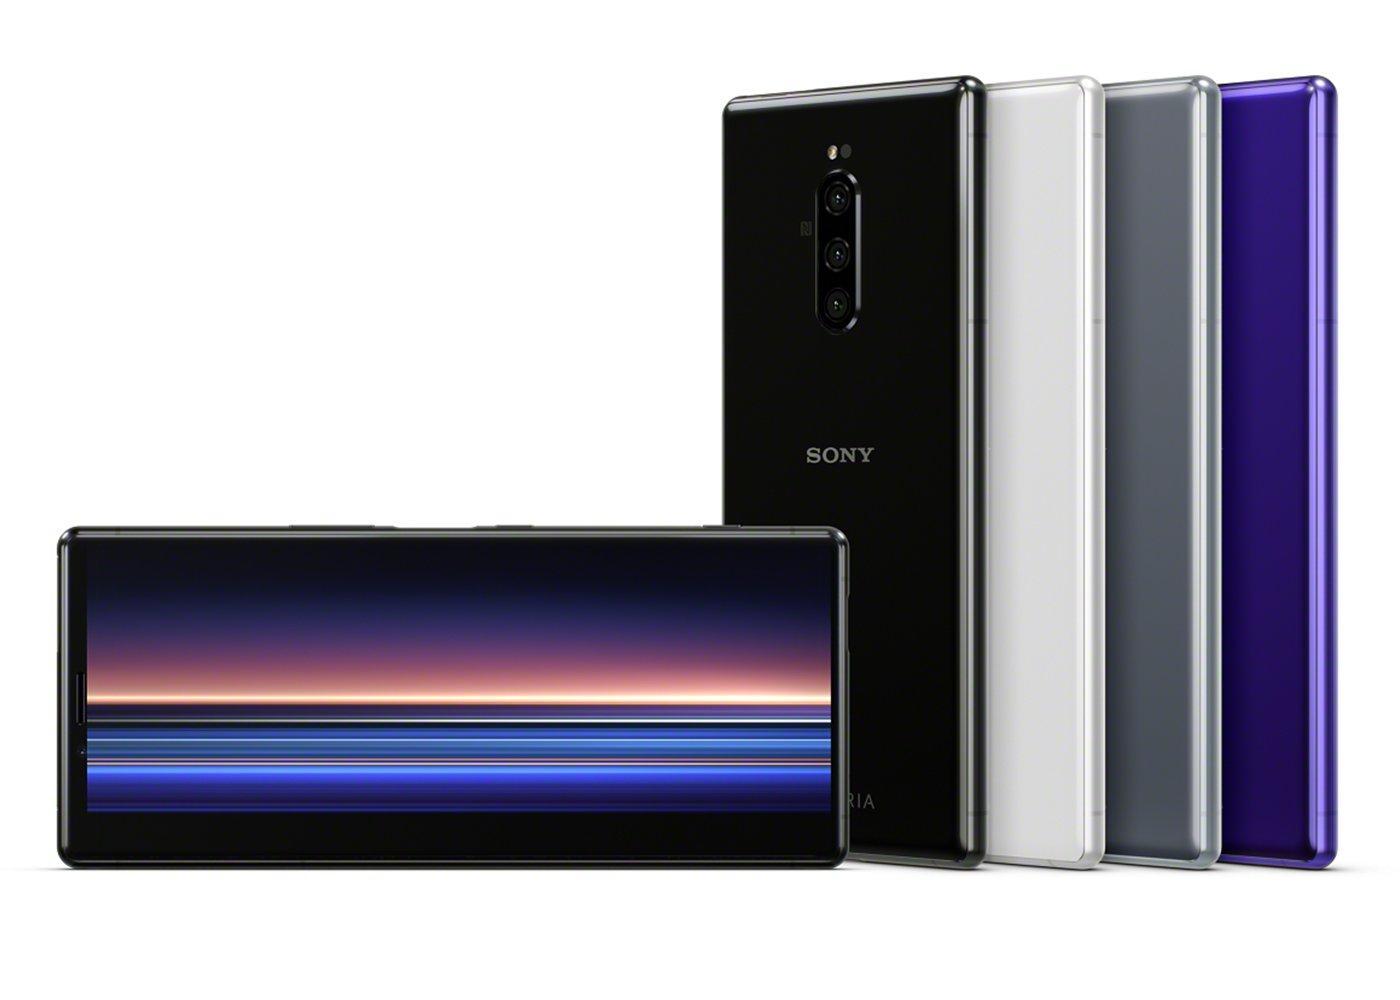 Pantalla del Sony Xperia 1